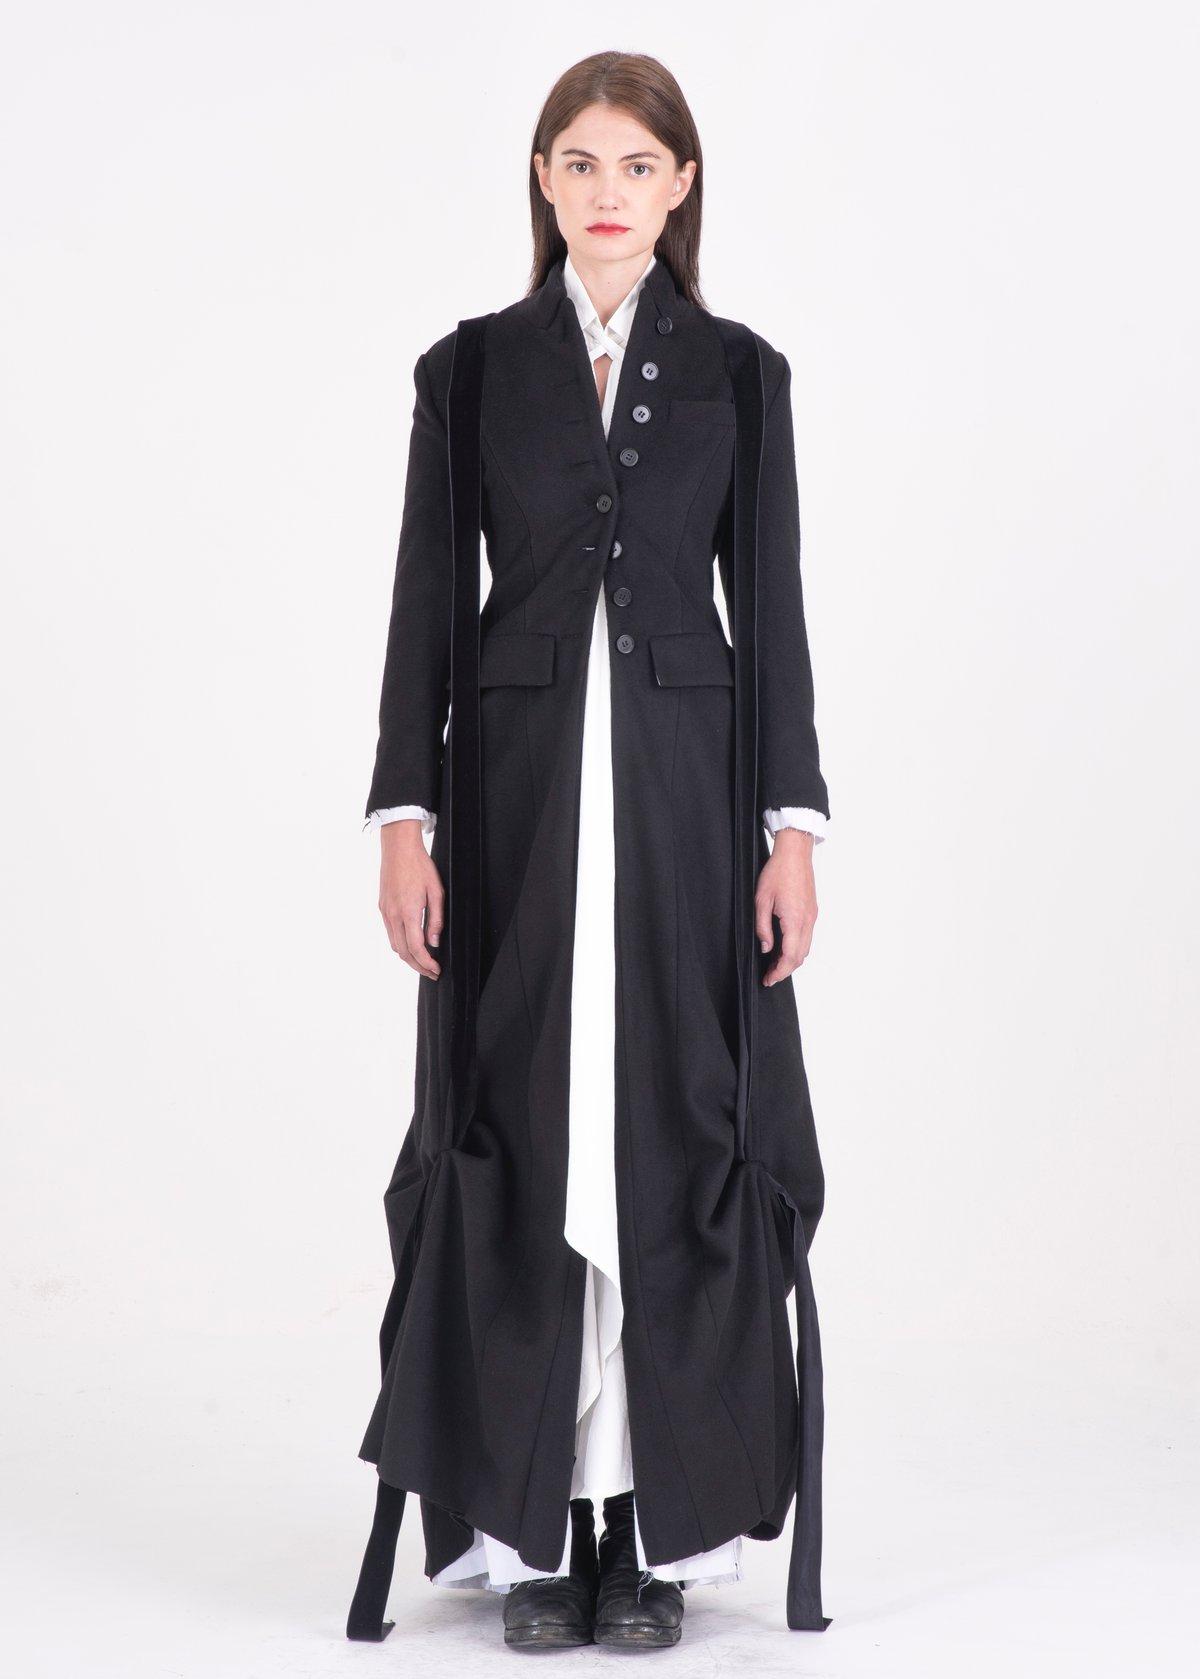 Image of Wool Blazer & Coat 002